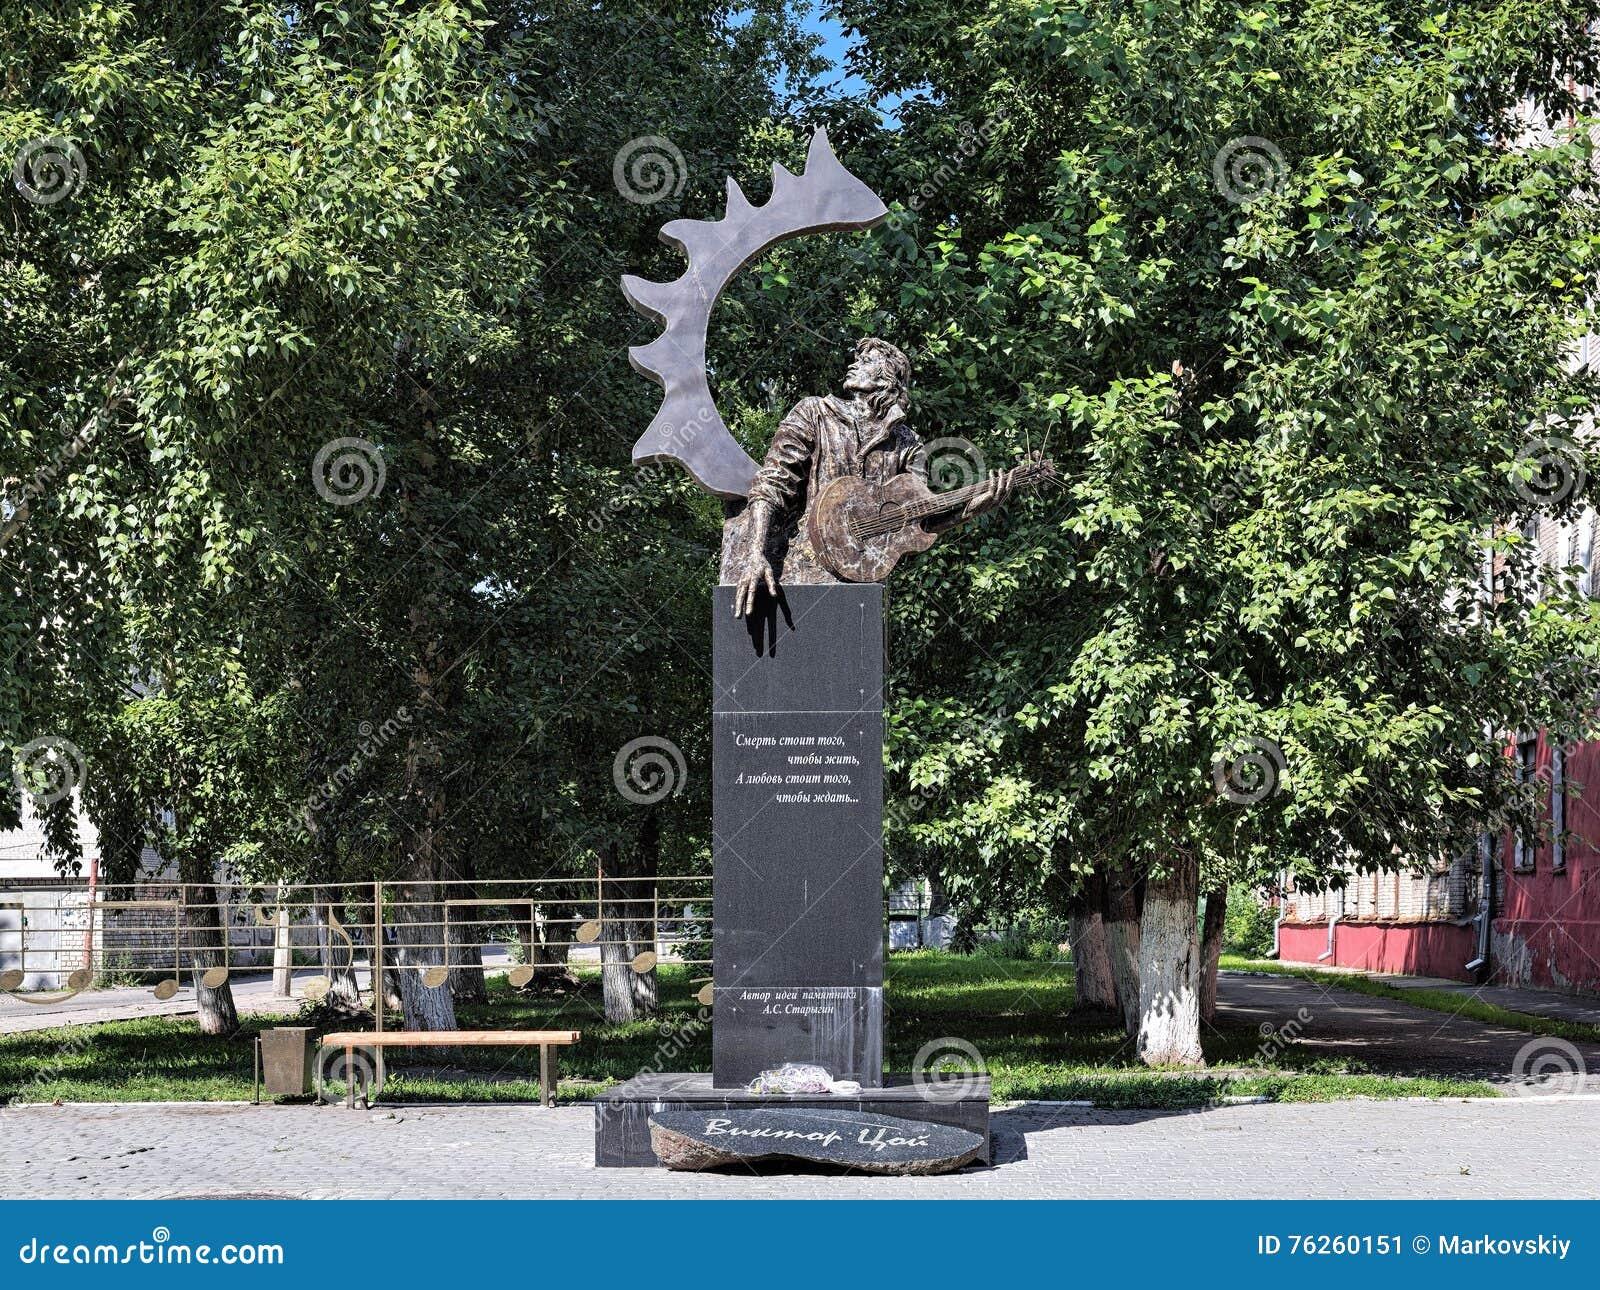 Monument to Viktor Tsoi will go to the Novgorod region 09/29/2015 86